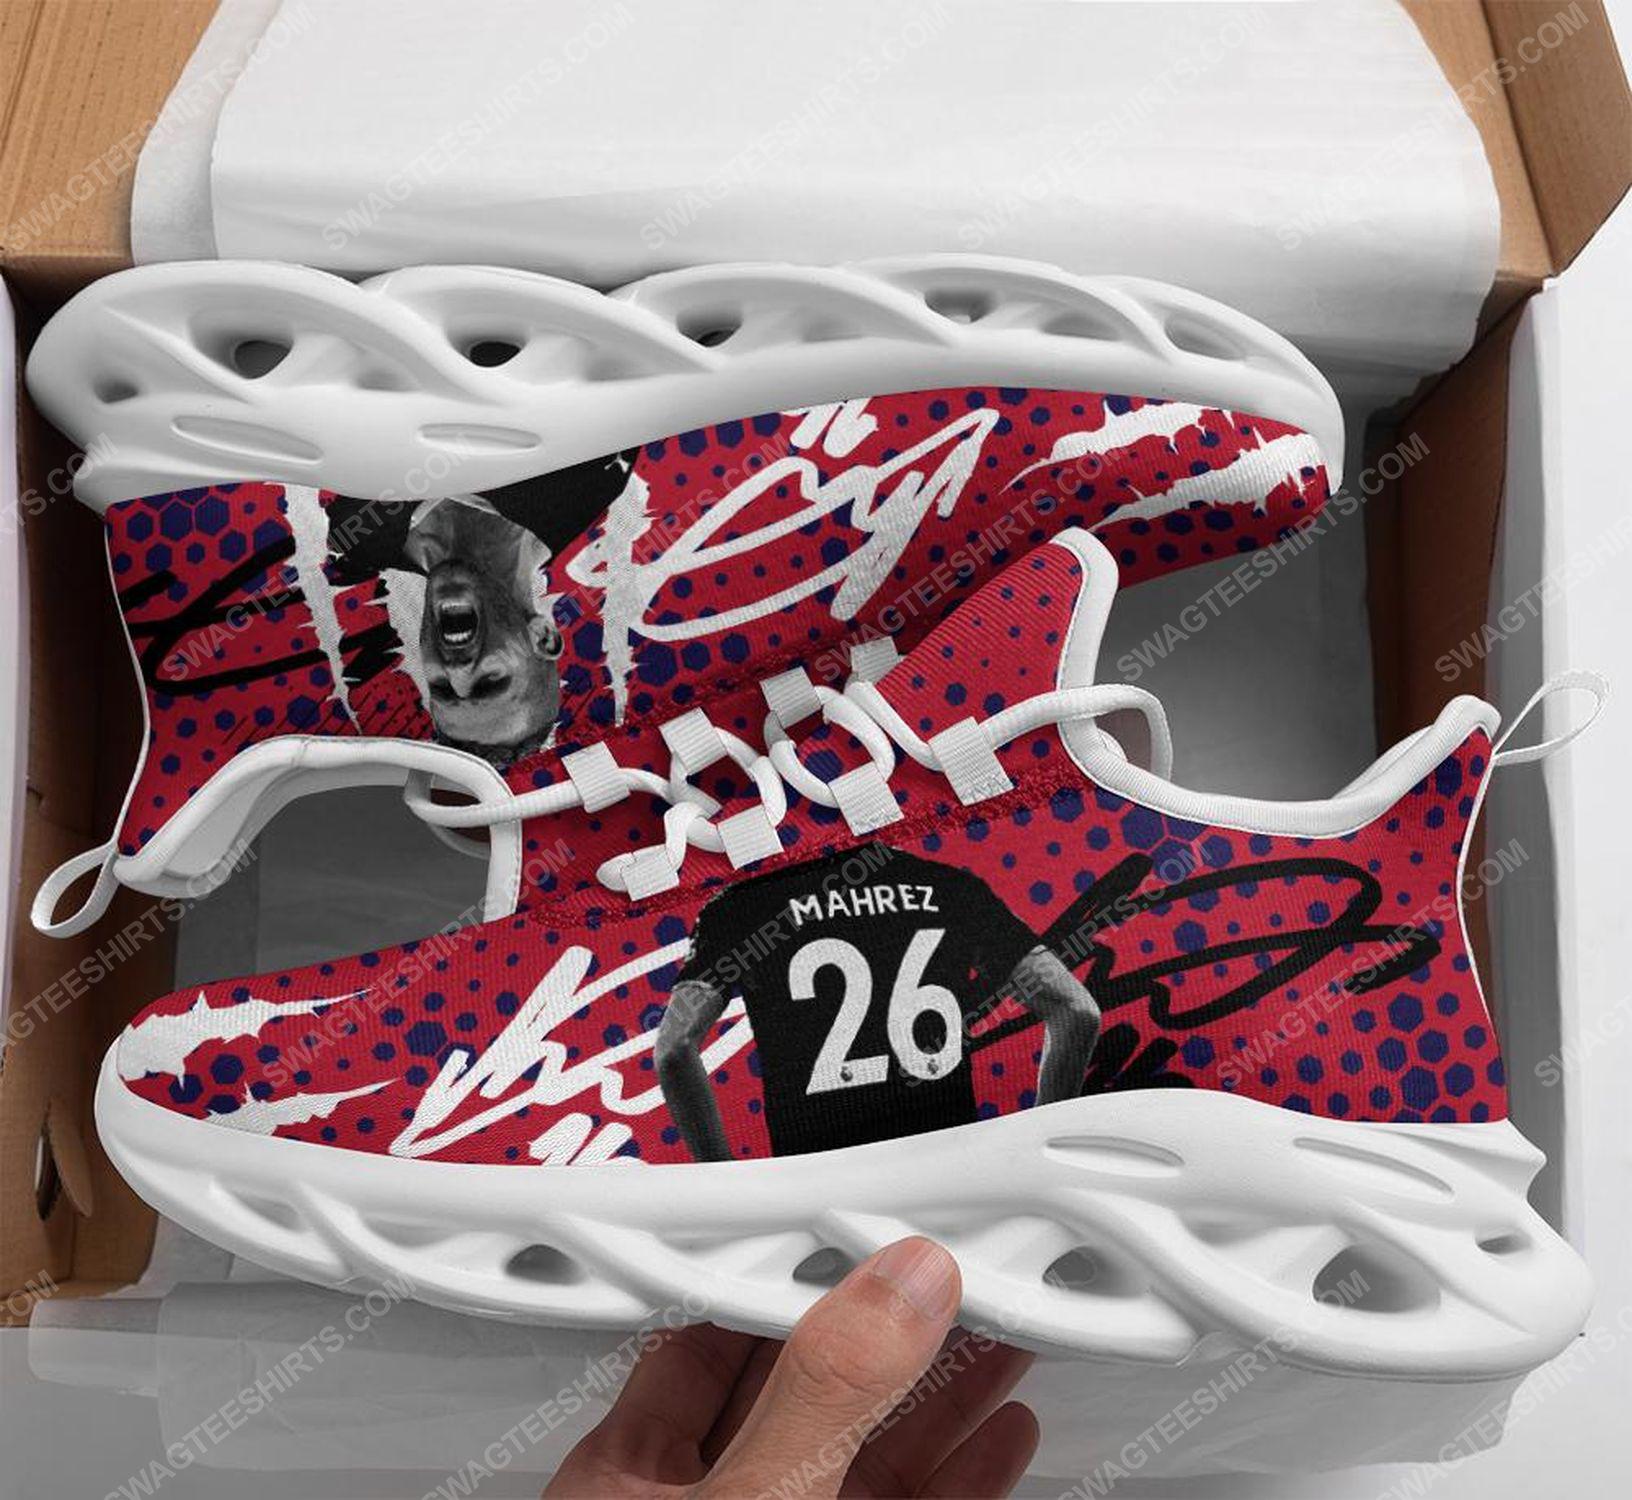 Riyad mahrez manchester city football club max soul shoes 1 - Copy (2)